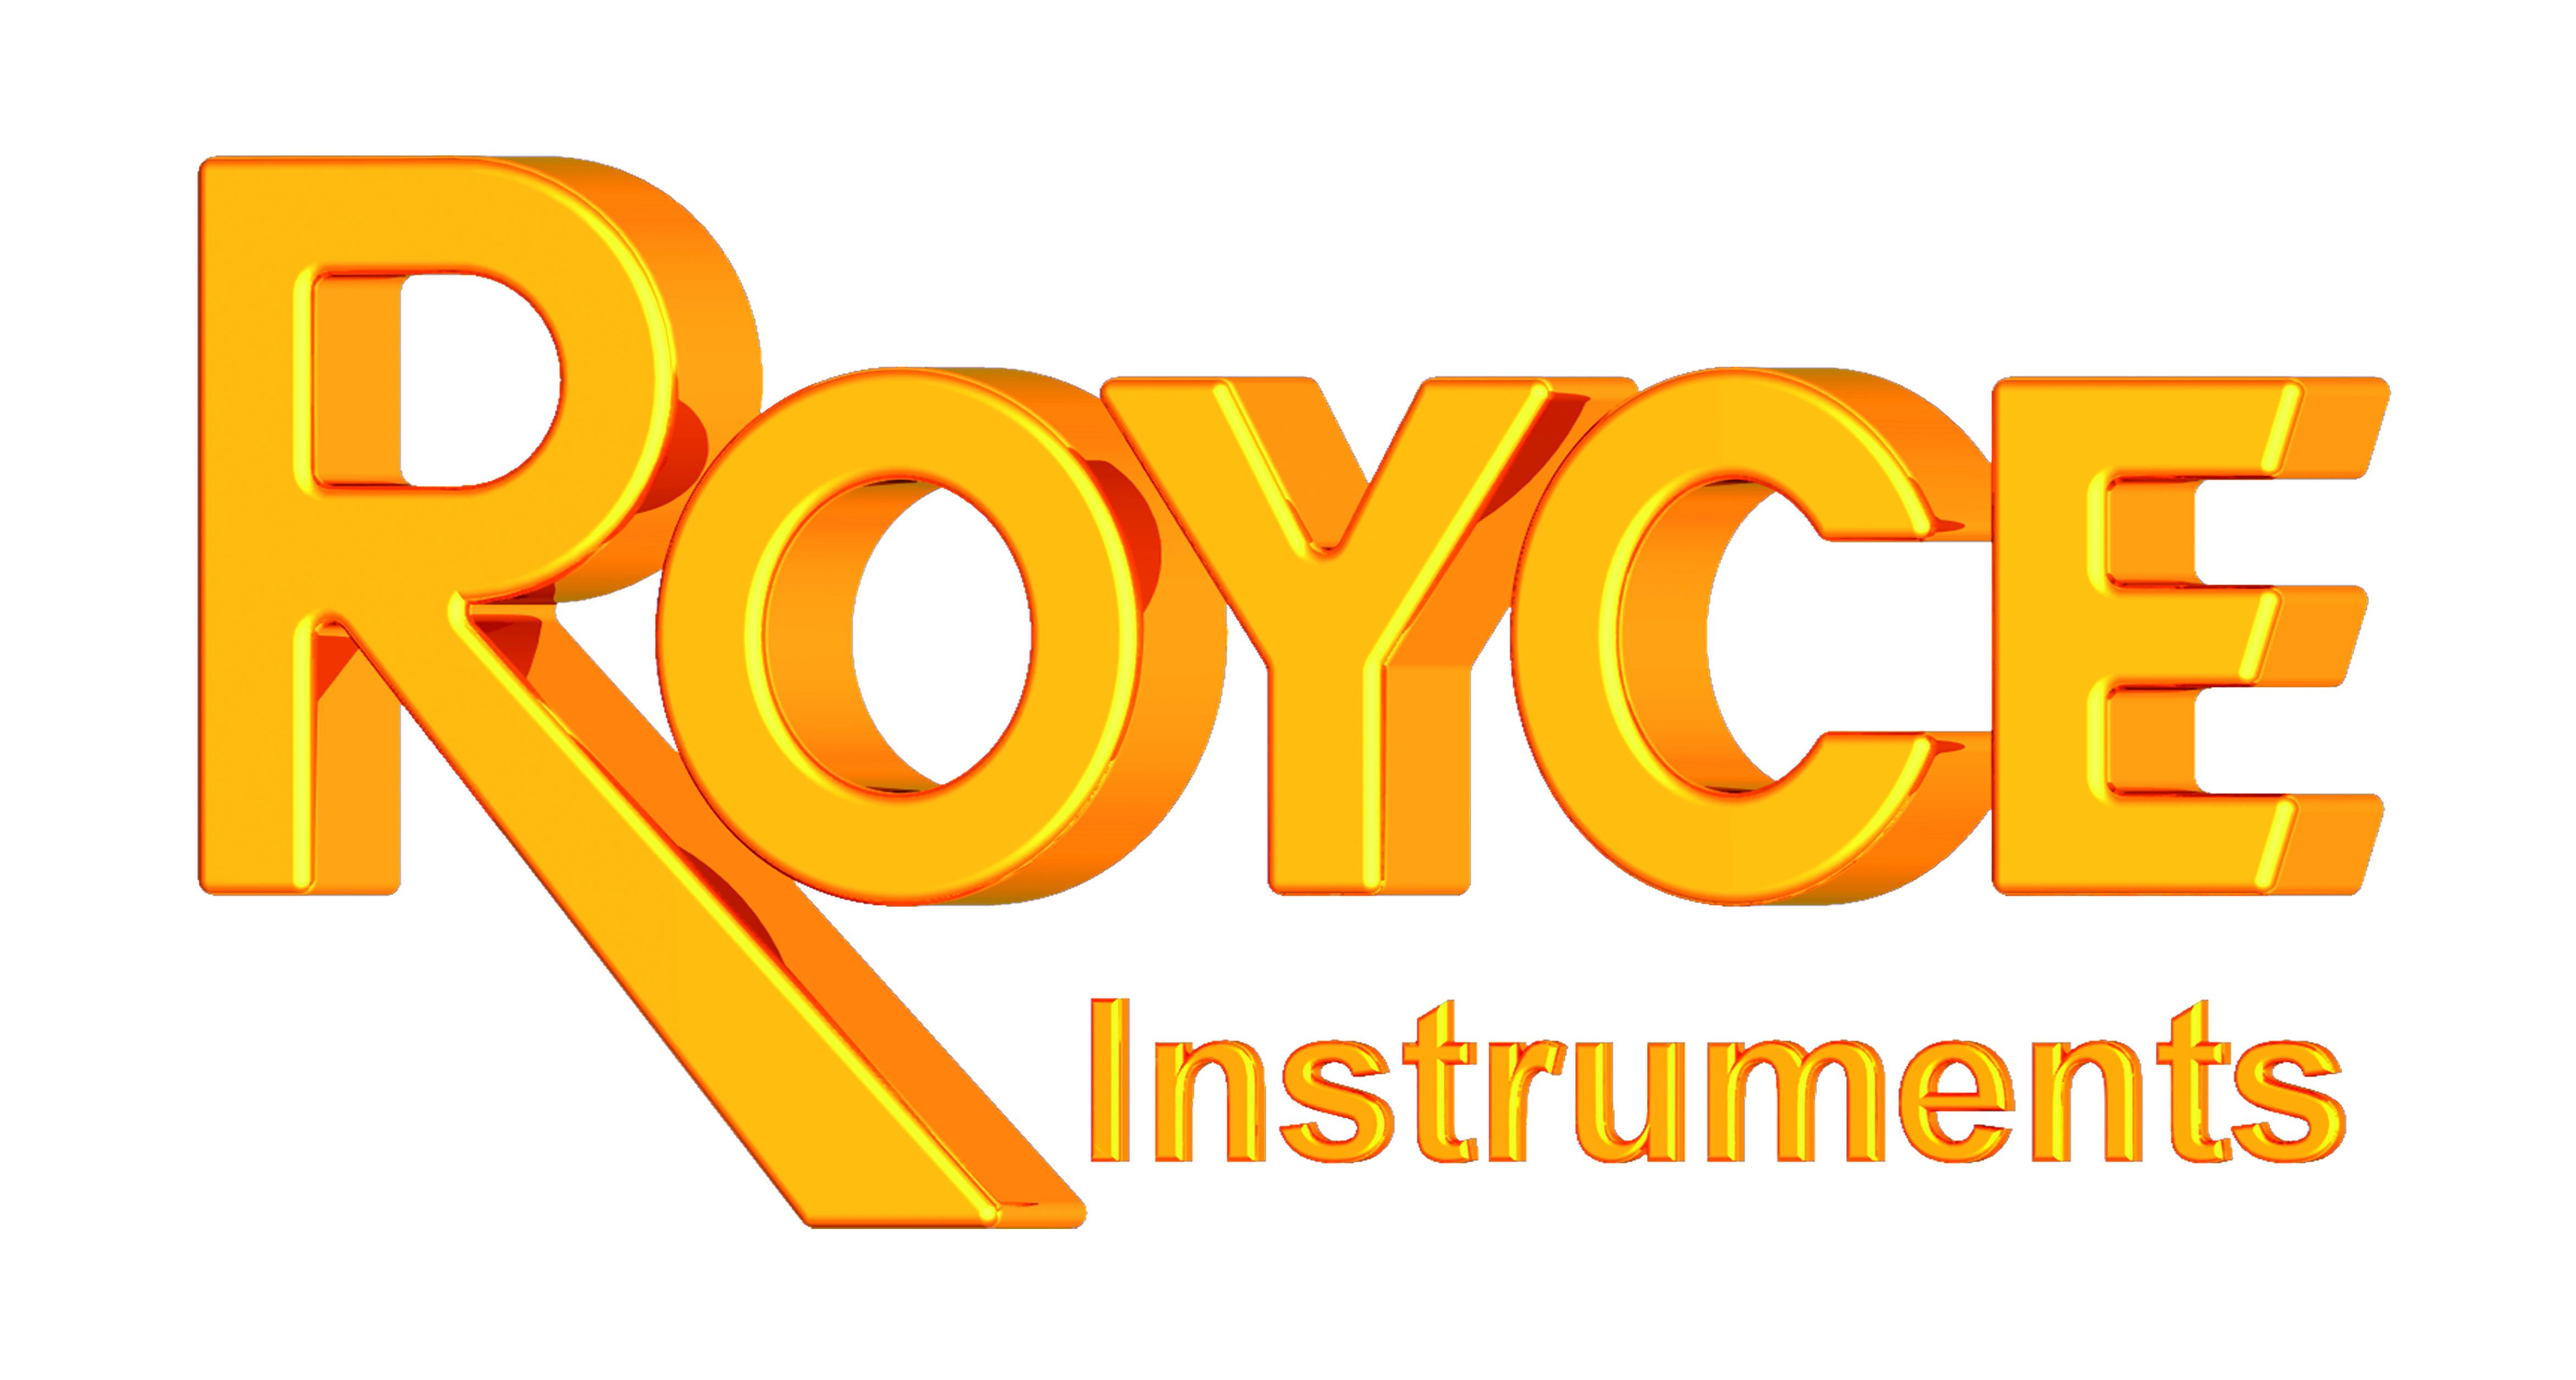 Royce Instruments logo